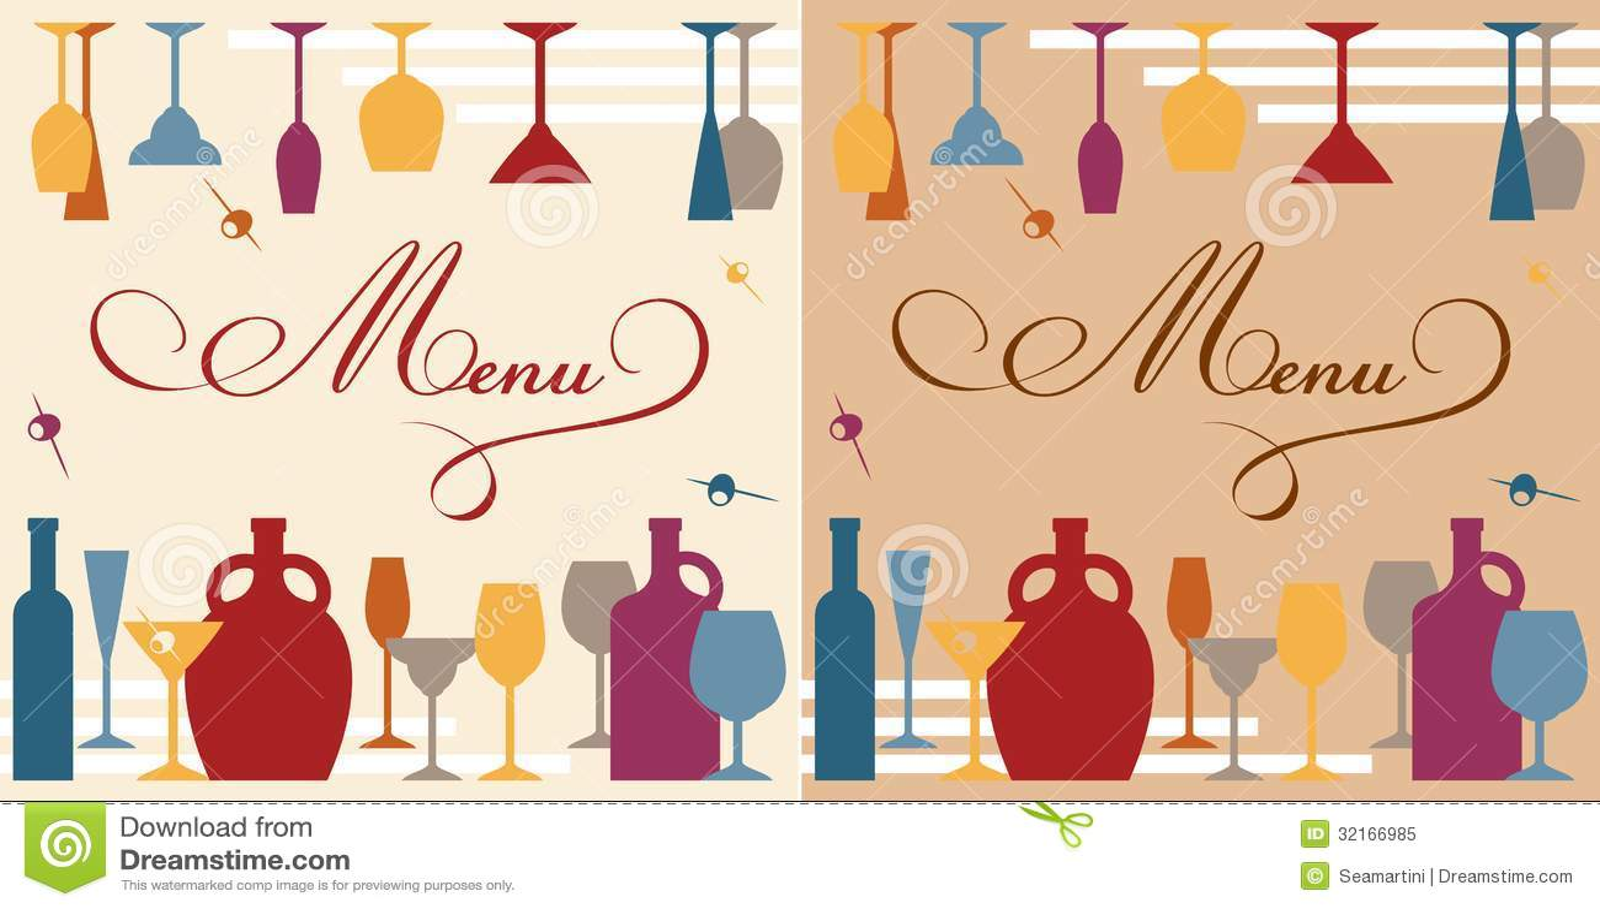 Menu Template For Bar Or Restaurant Stock Vector - Illustration of ...